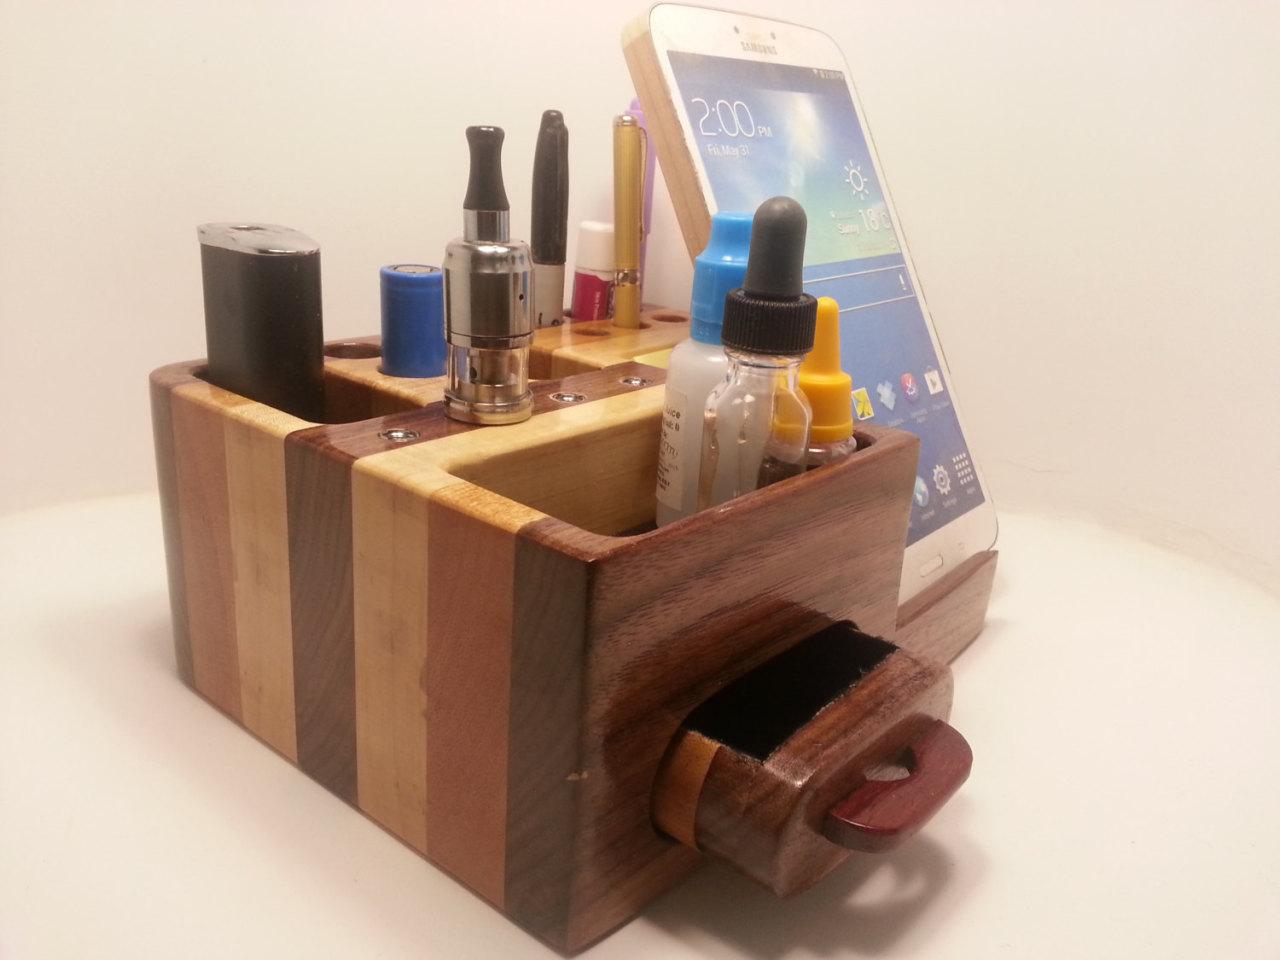 WOOD ART BOXES  Ecig Organizer, Vape stand, Cell Phone